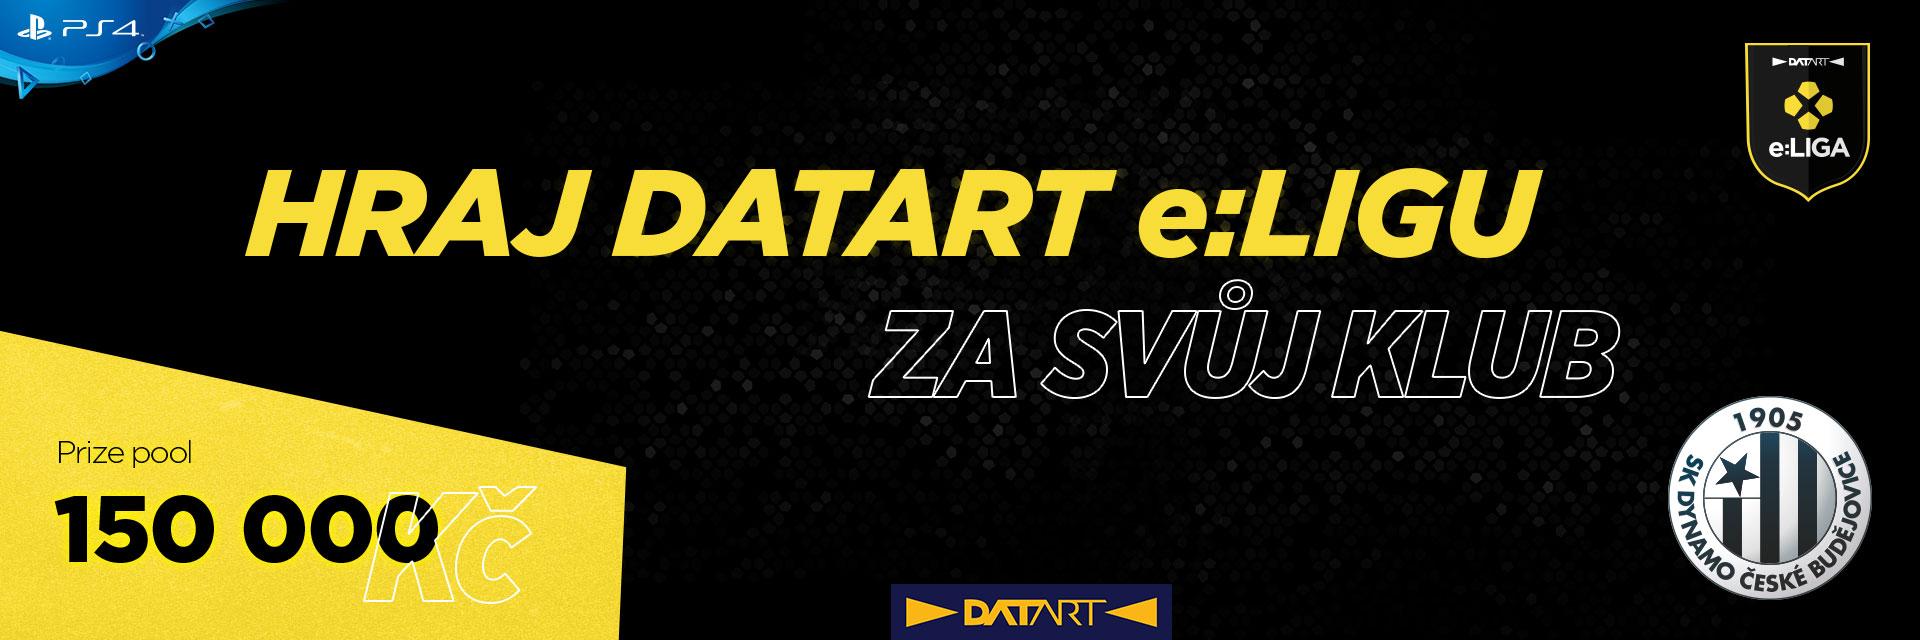 datart-e-liga-klubove-kolo-sk-dynamo-ceske-budejovice-2